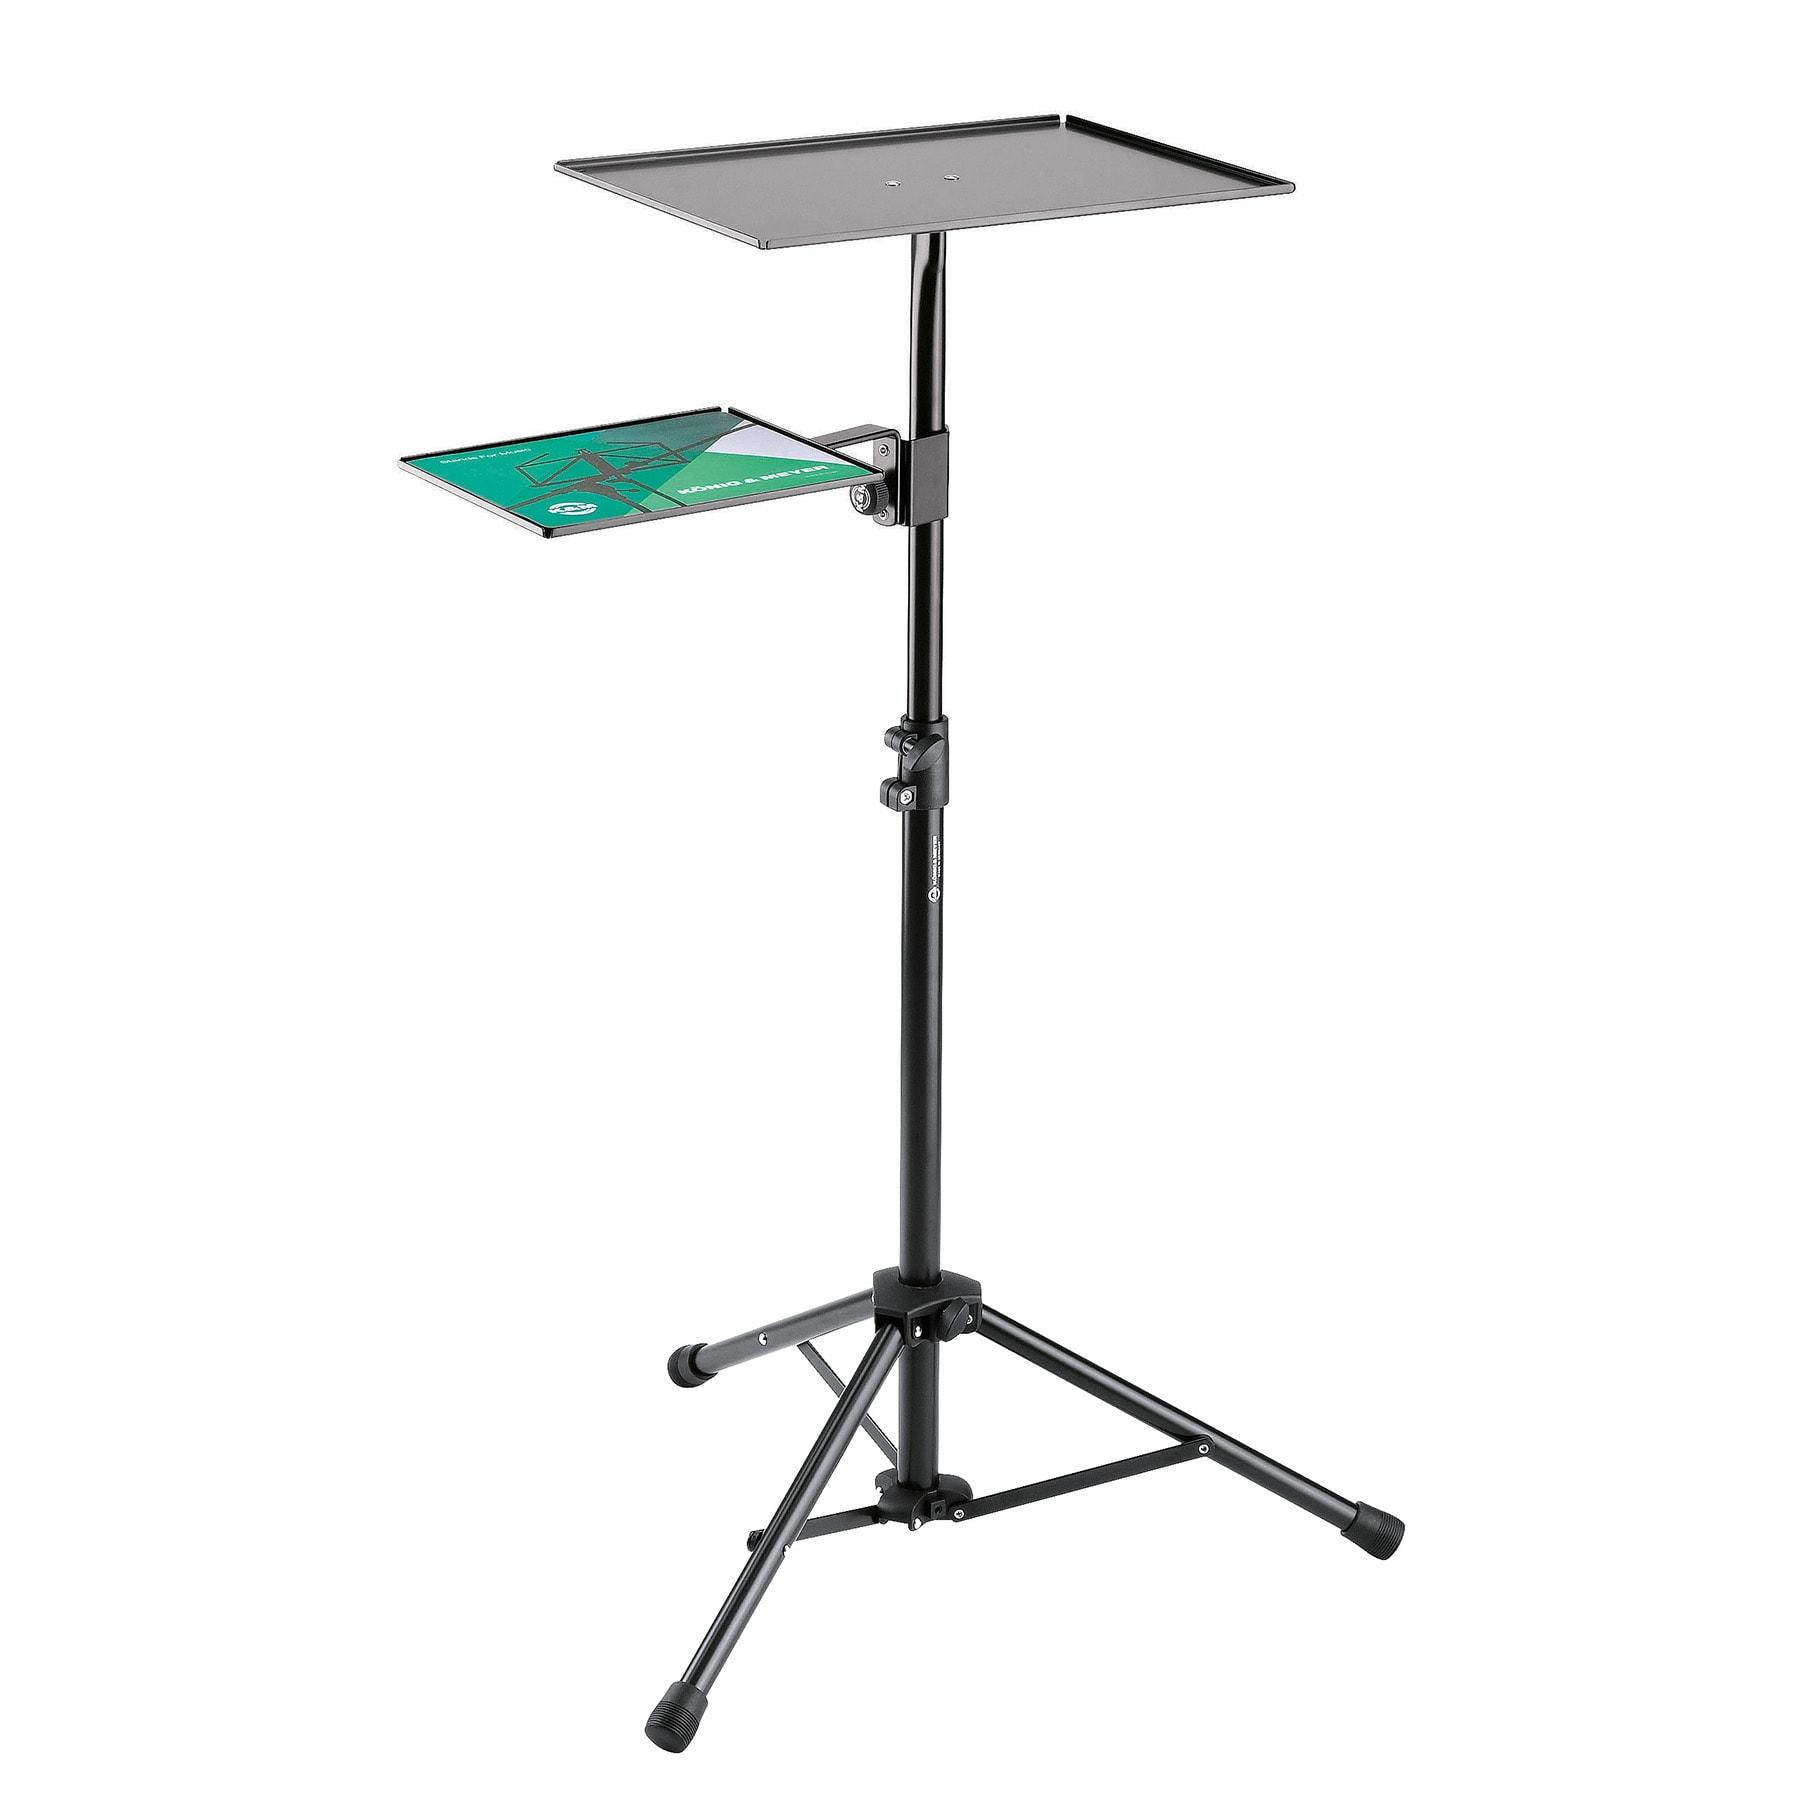 KM12150 - Laptop stand